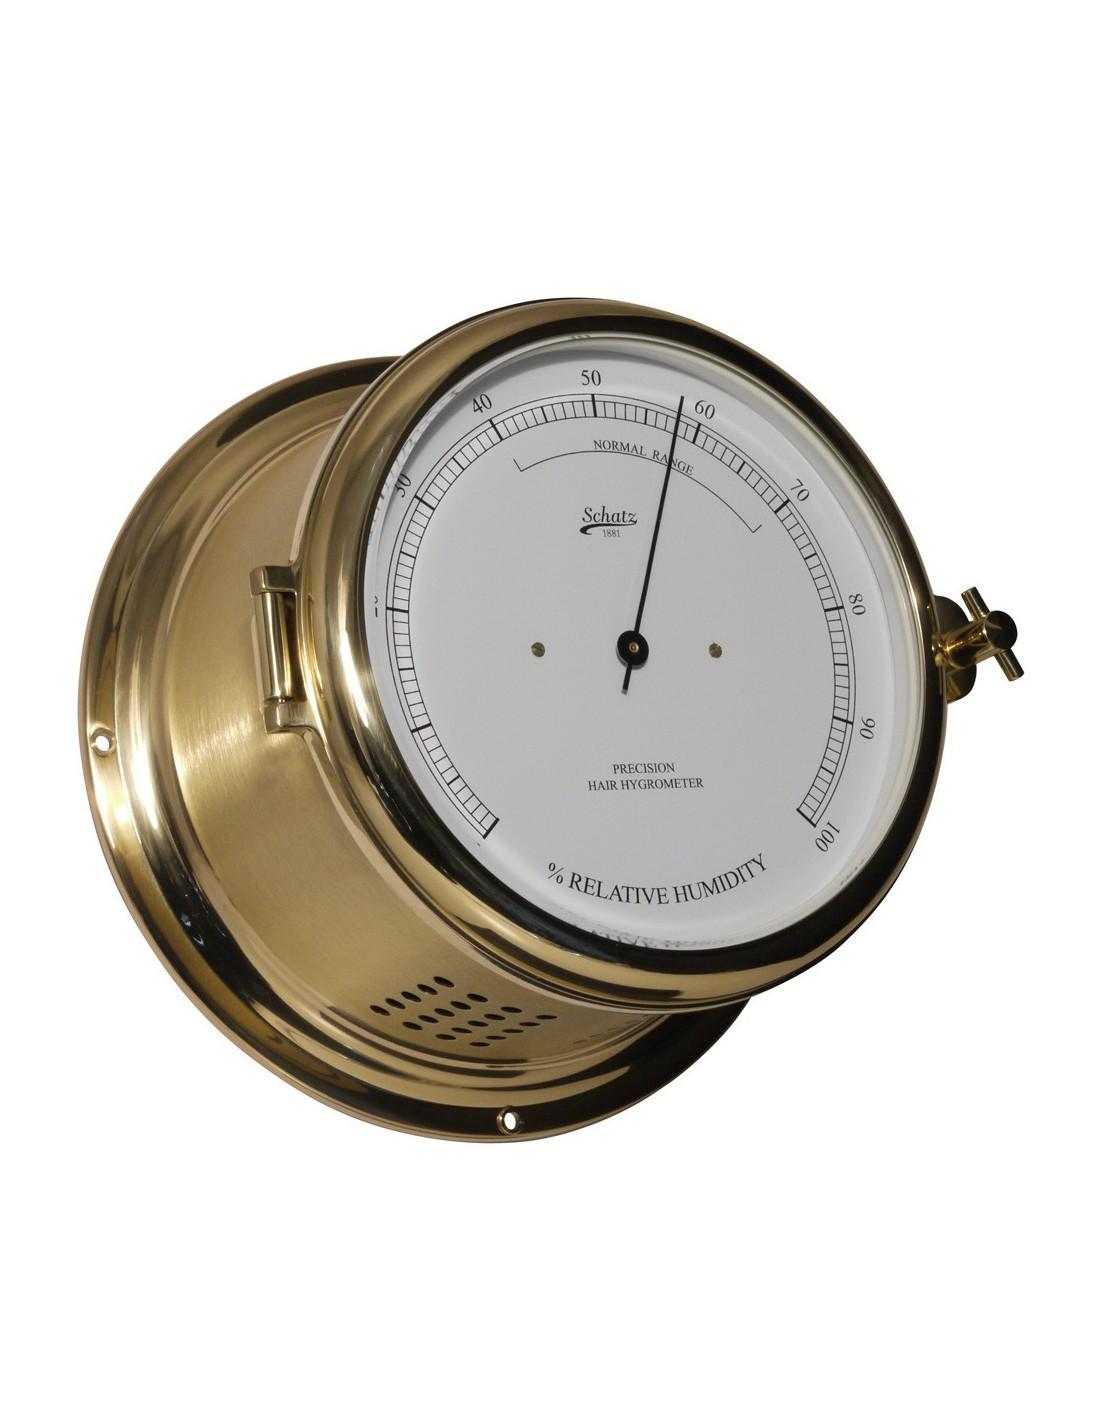 Royal 180 - Haarhygrometer - Mat Messing - Schatz 1881 - Scheepsinstrumenten - 481 H